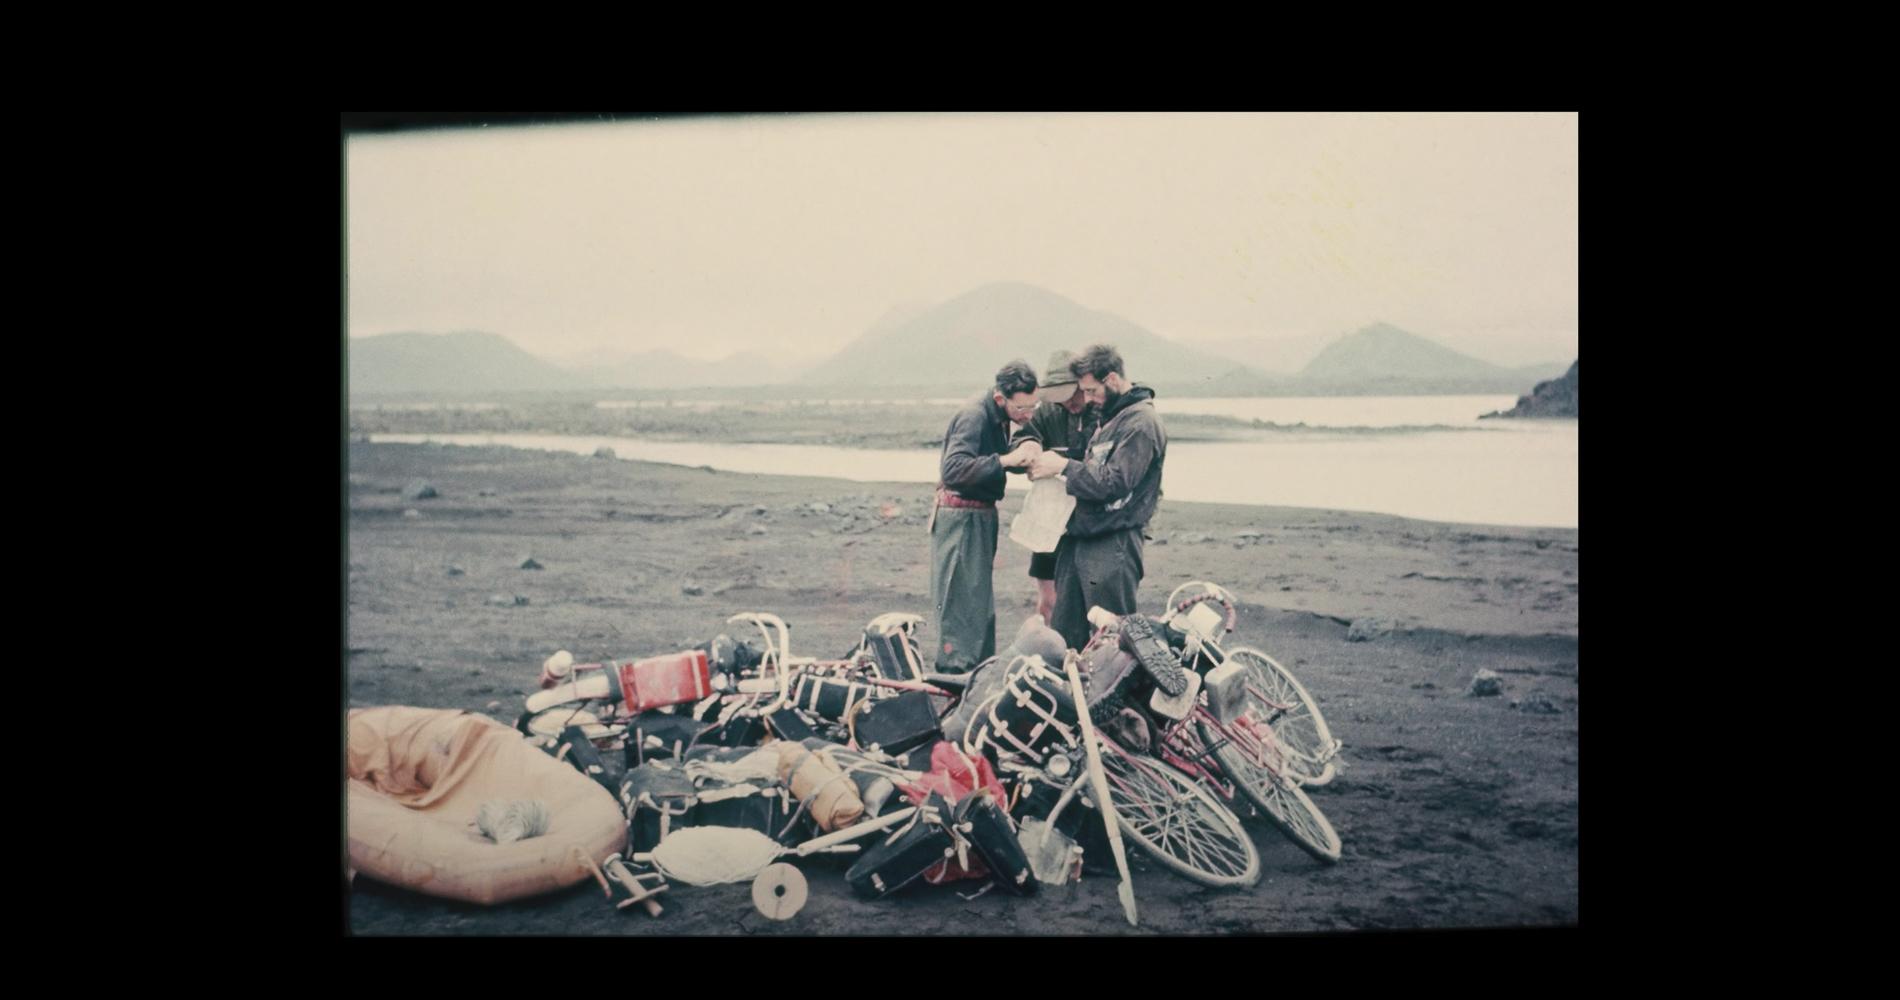 Video: A 1958 trek across the interior of Iceland